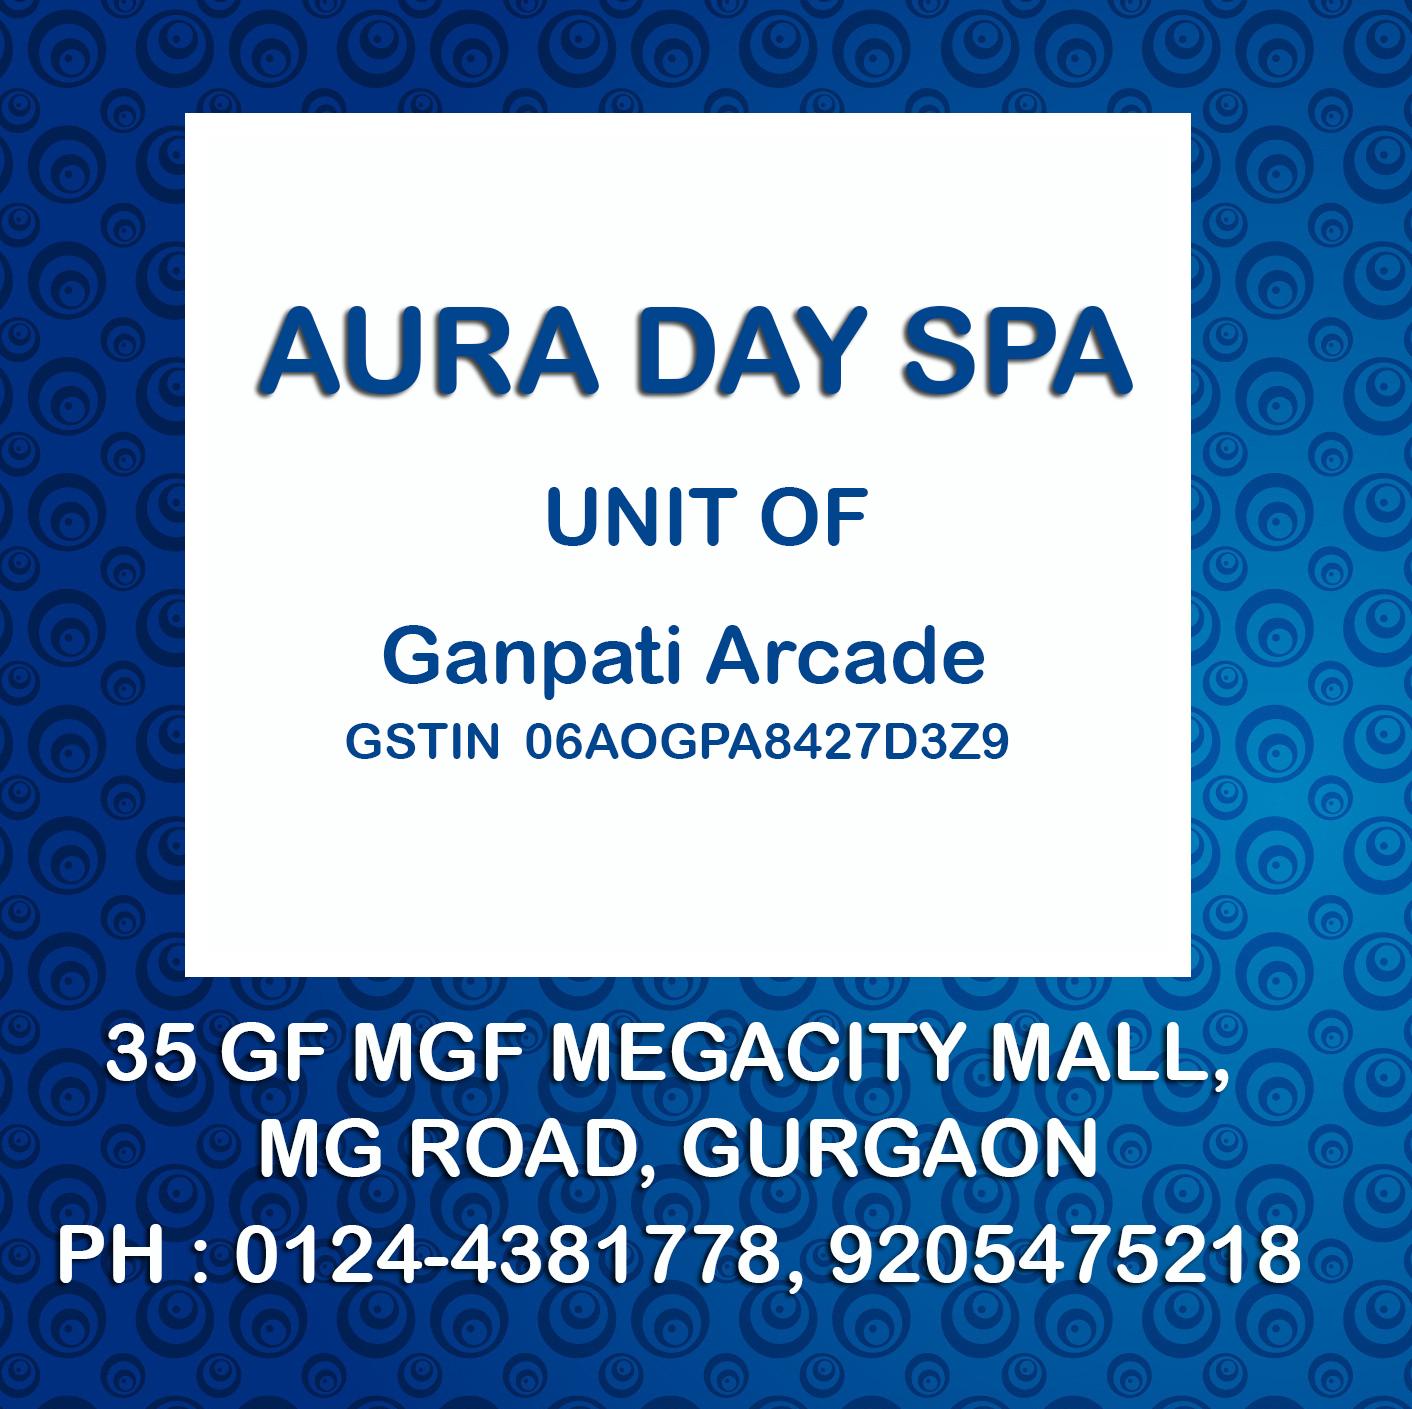 Aura Day Spa - MGF Mall - Gurgaon